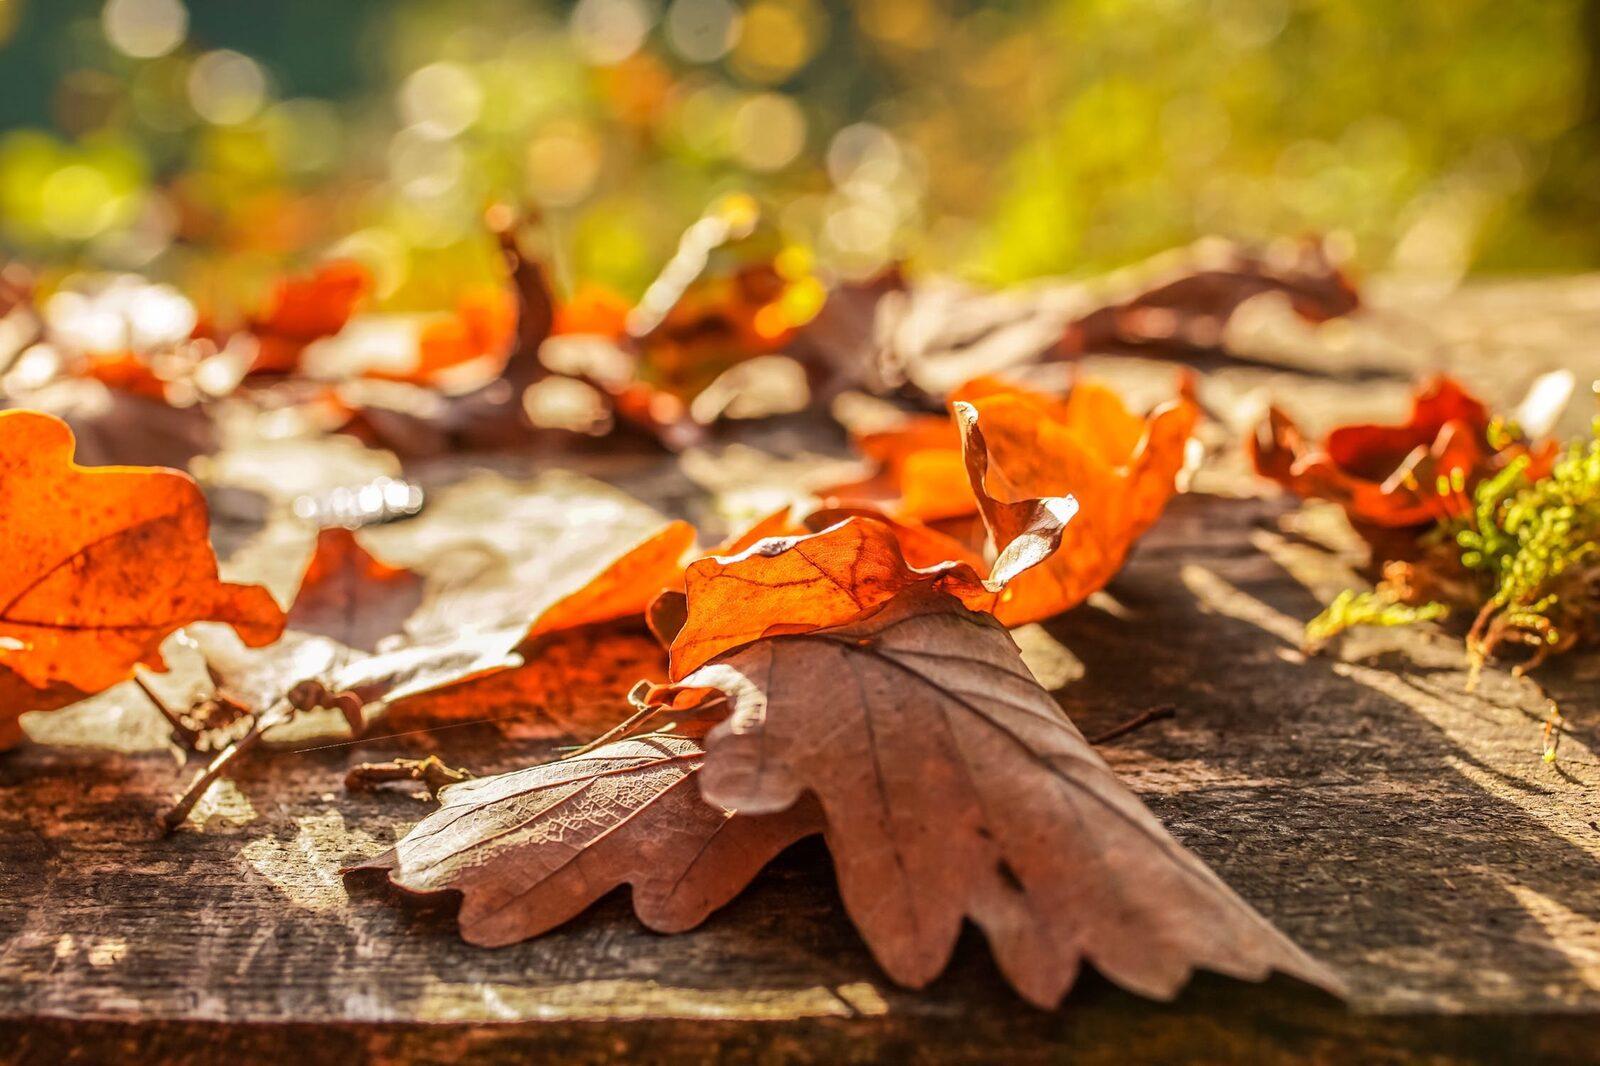 Autumn holiday in Zeeland